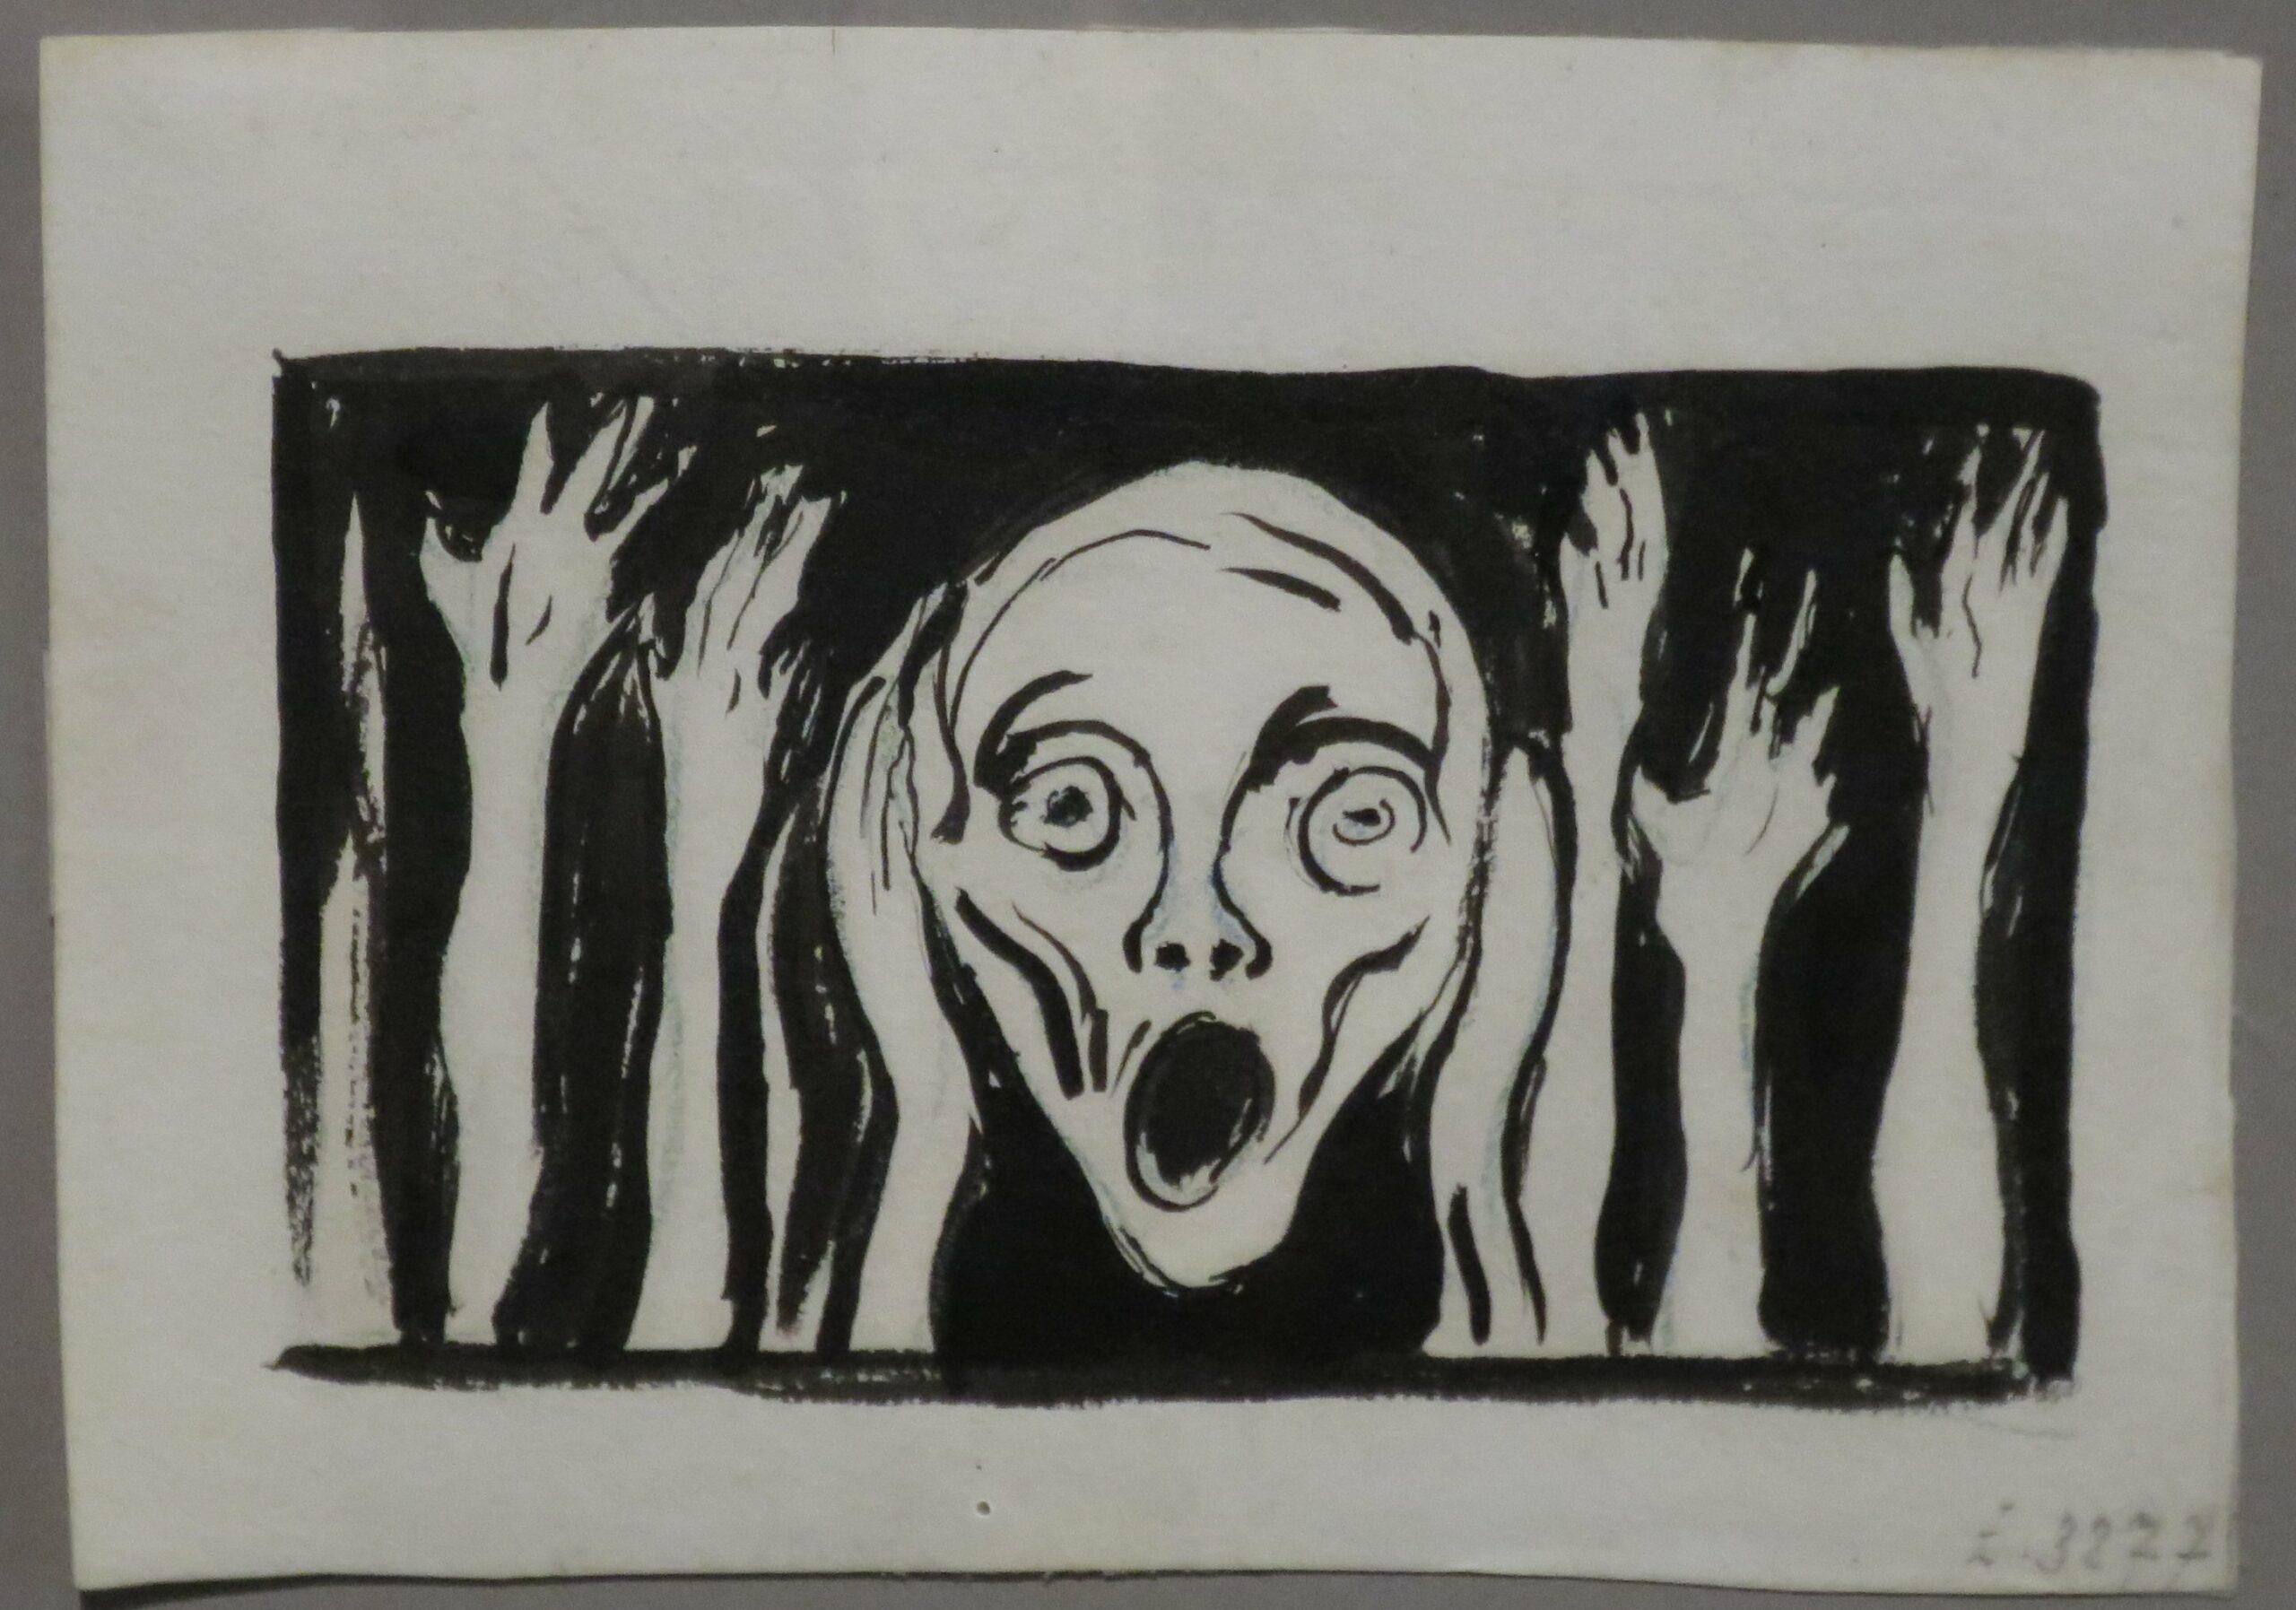 Edvard Munche, L'urlo